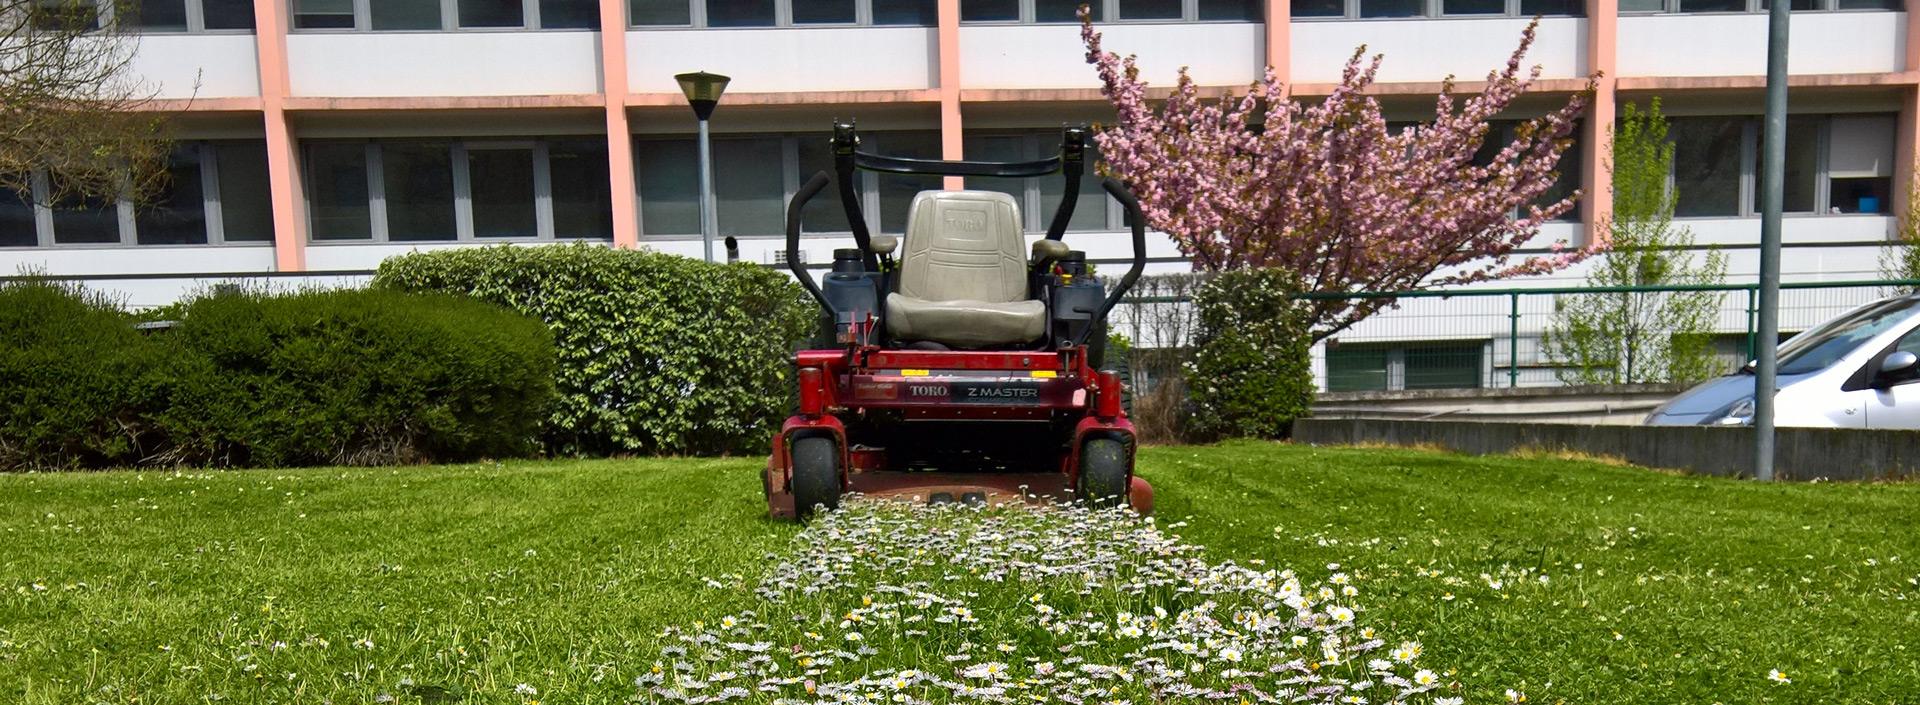 paysagiste toulouse, jardinier toulouse , jardinier colomiers, paysagiste colomiers